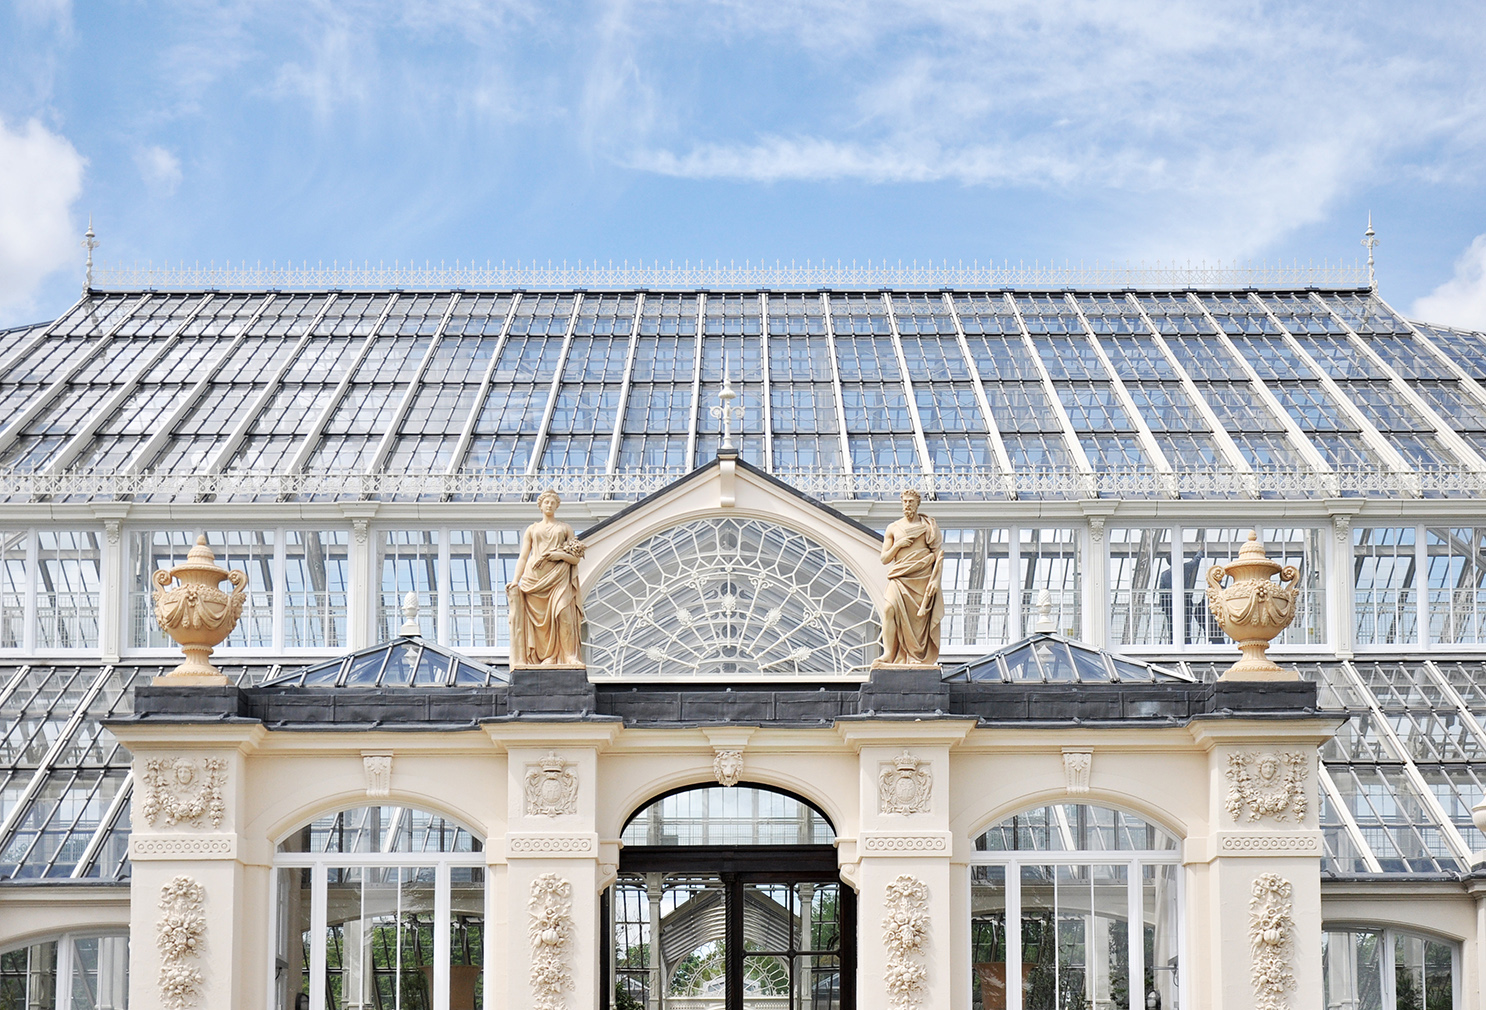 Kew Gardens' revamped Temperate House